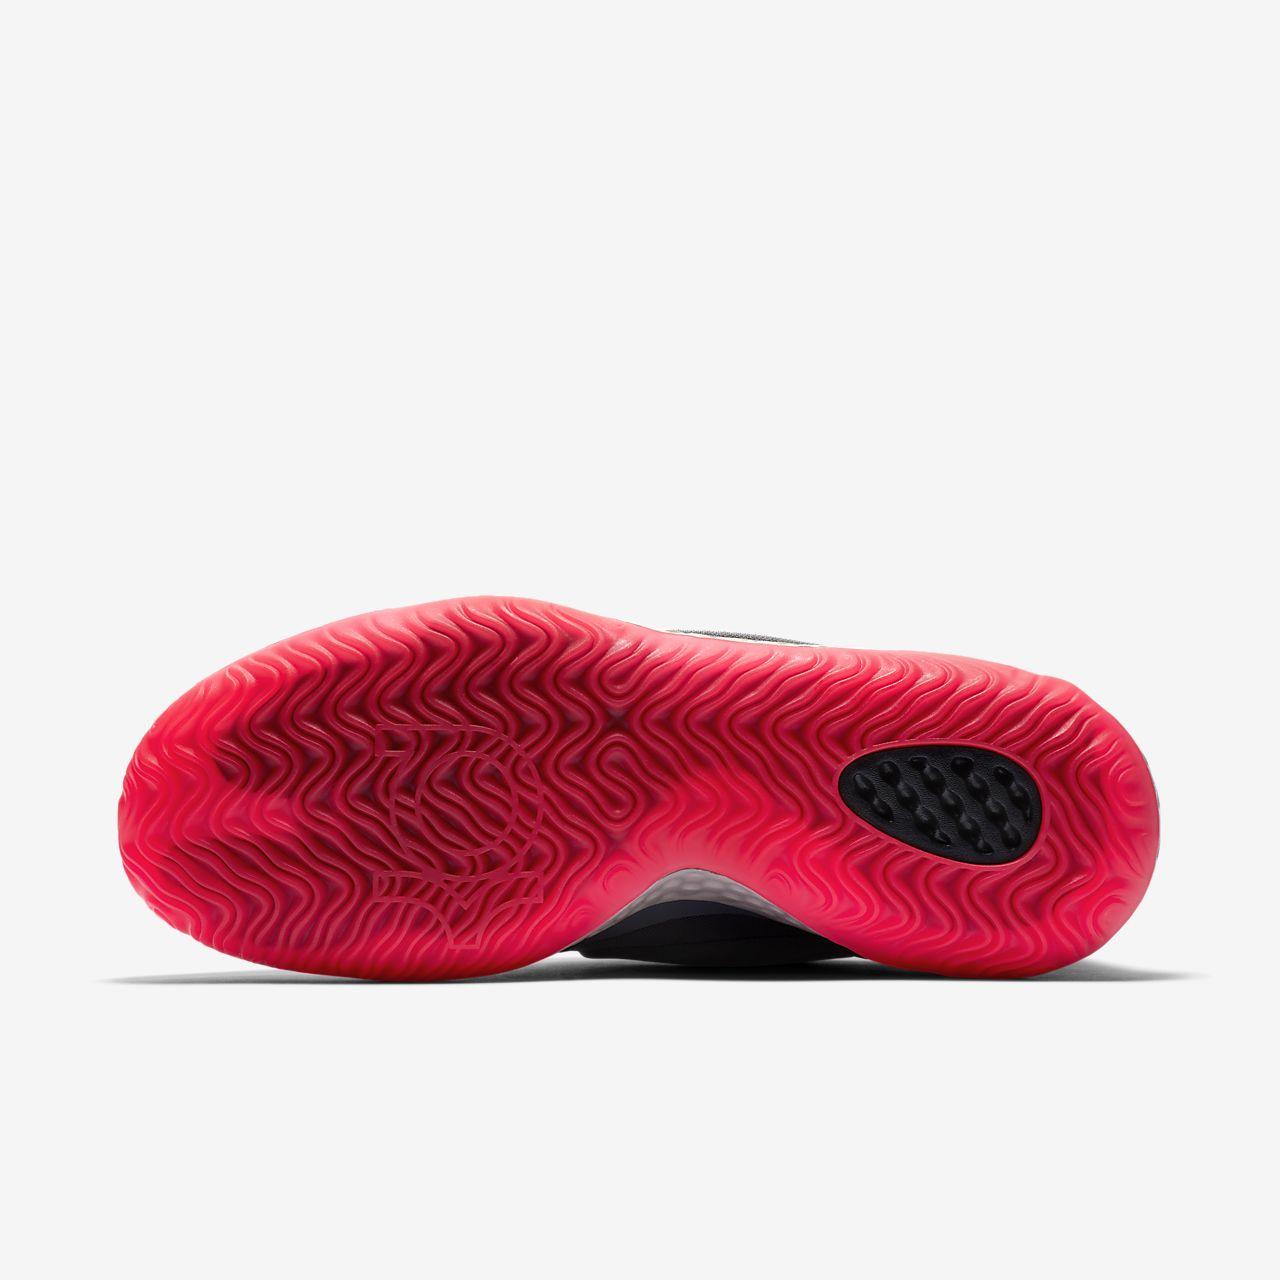 Nike KD Trey 5 VII Mens Basketball Shoes